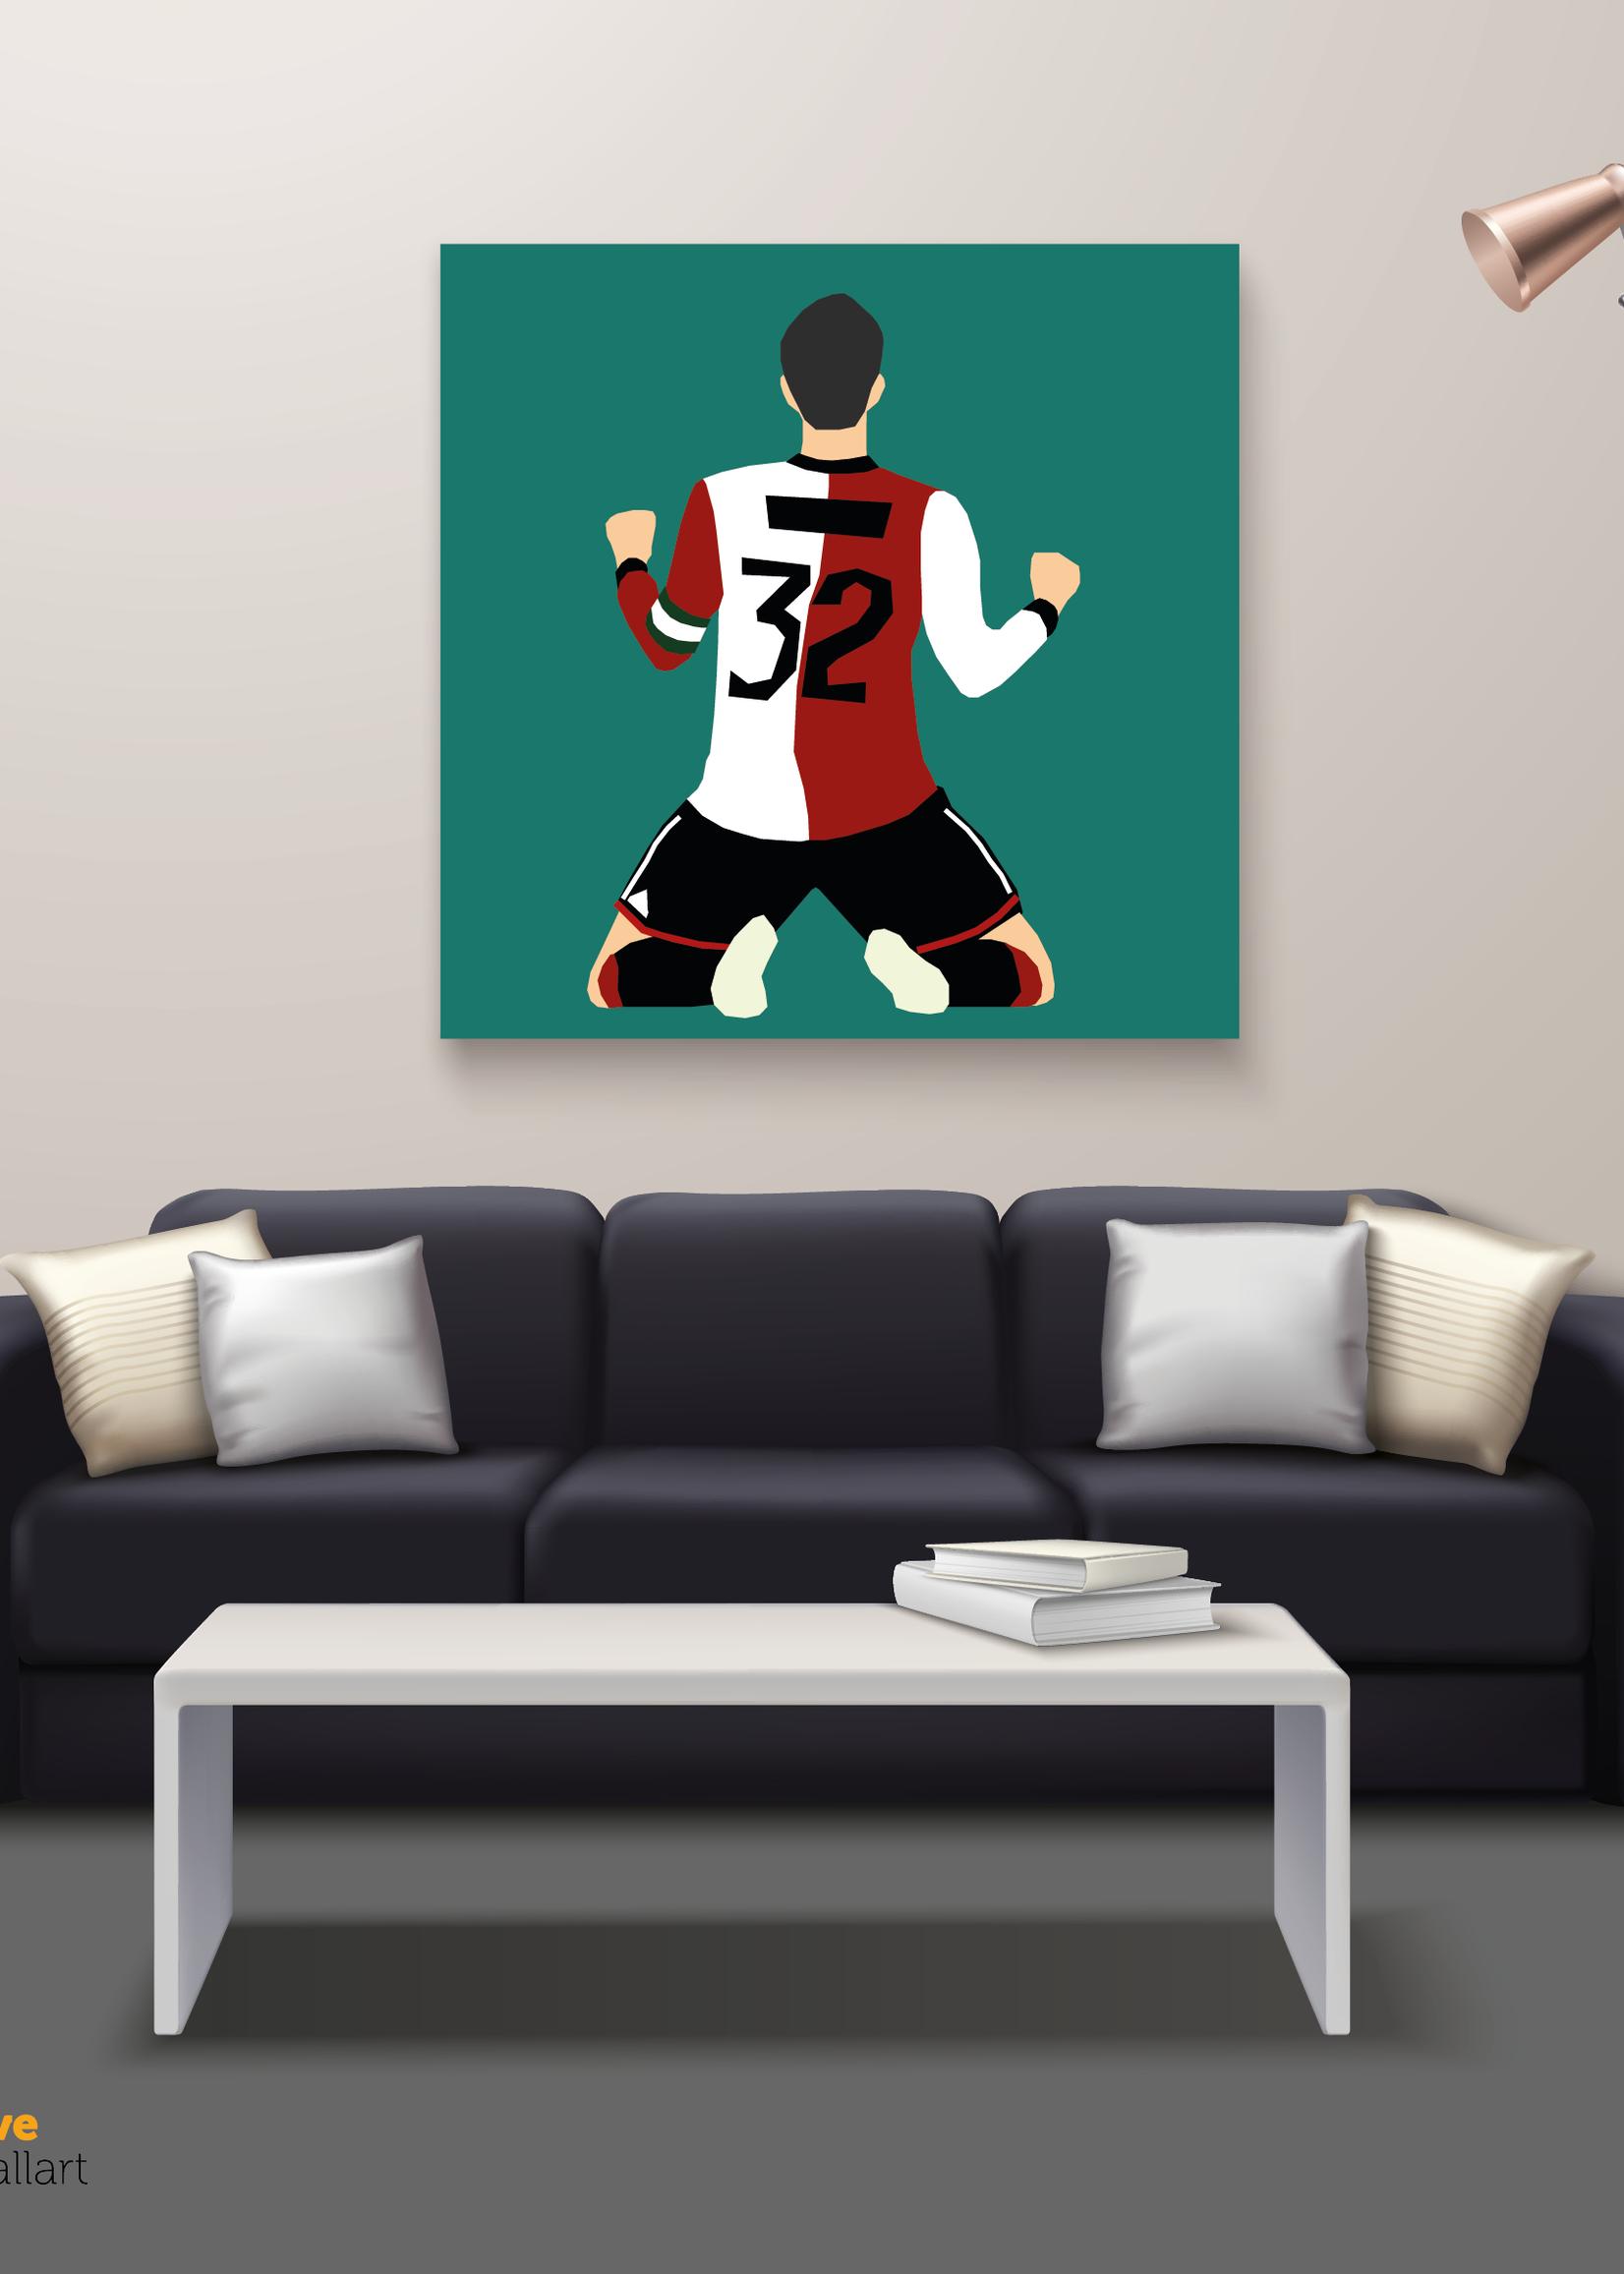 We Love Football Art Graue Fuchs We Love Football Art